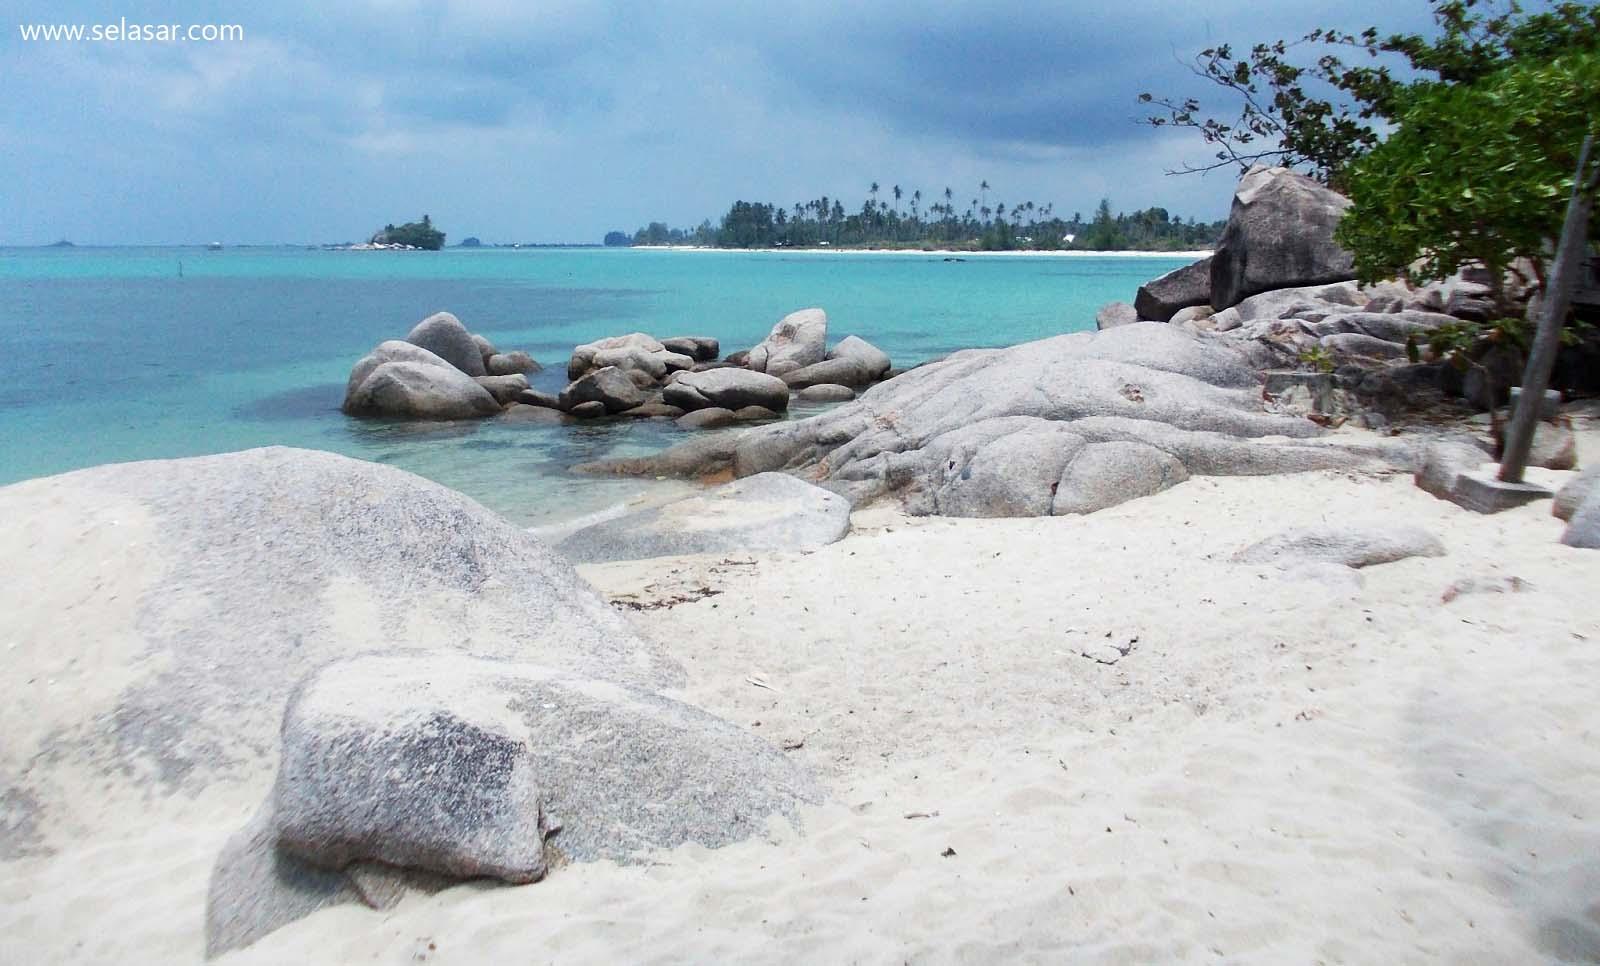 Serupa Walaupun Tak Sama, Bebatuan Eksotis di Pantai Trikora  Mirip dengan Belitung